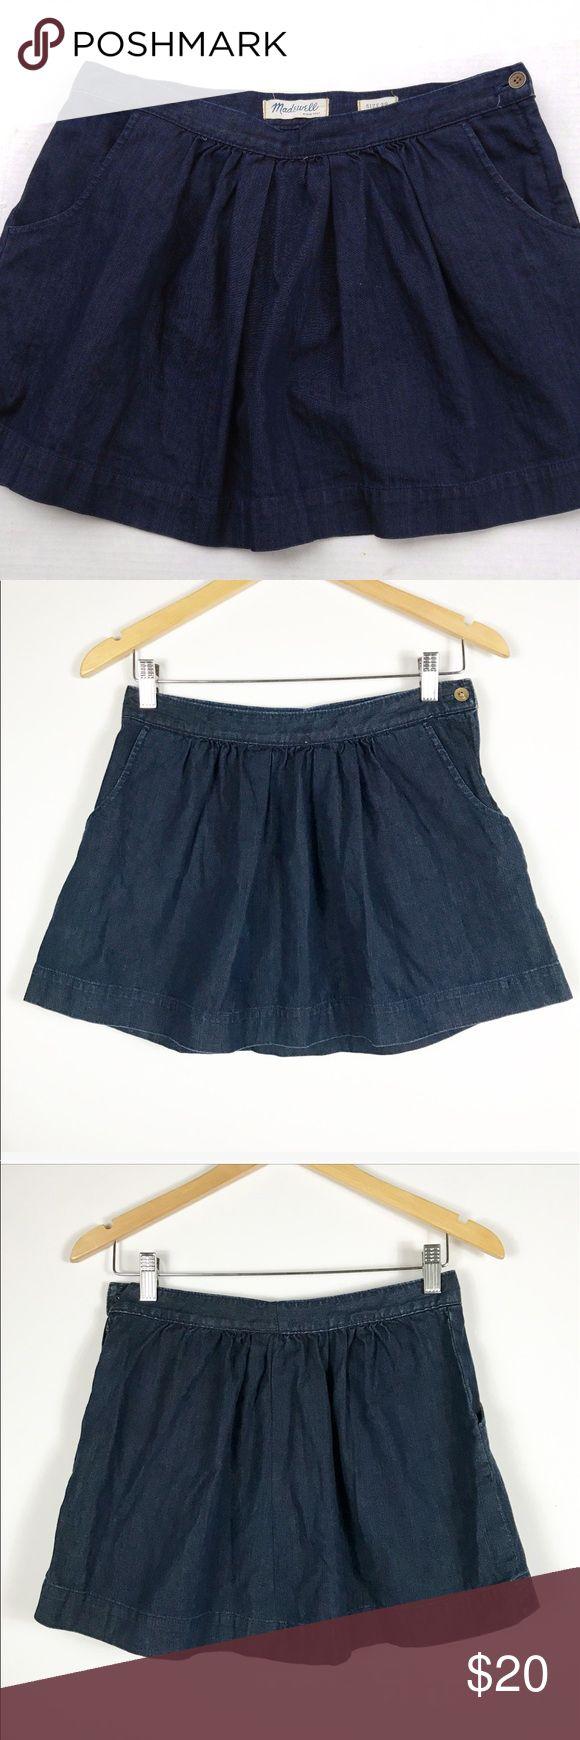 "Madewell denim pocket skater skirt 6 Madewell denim pocket skater skirt. No size tag but measures approx 14""w 14"" long laying flat. (6) Great condition! Madewell Skirts Mini"